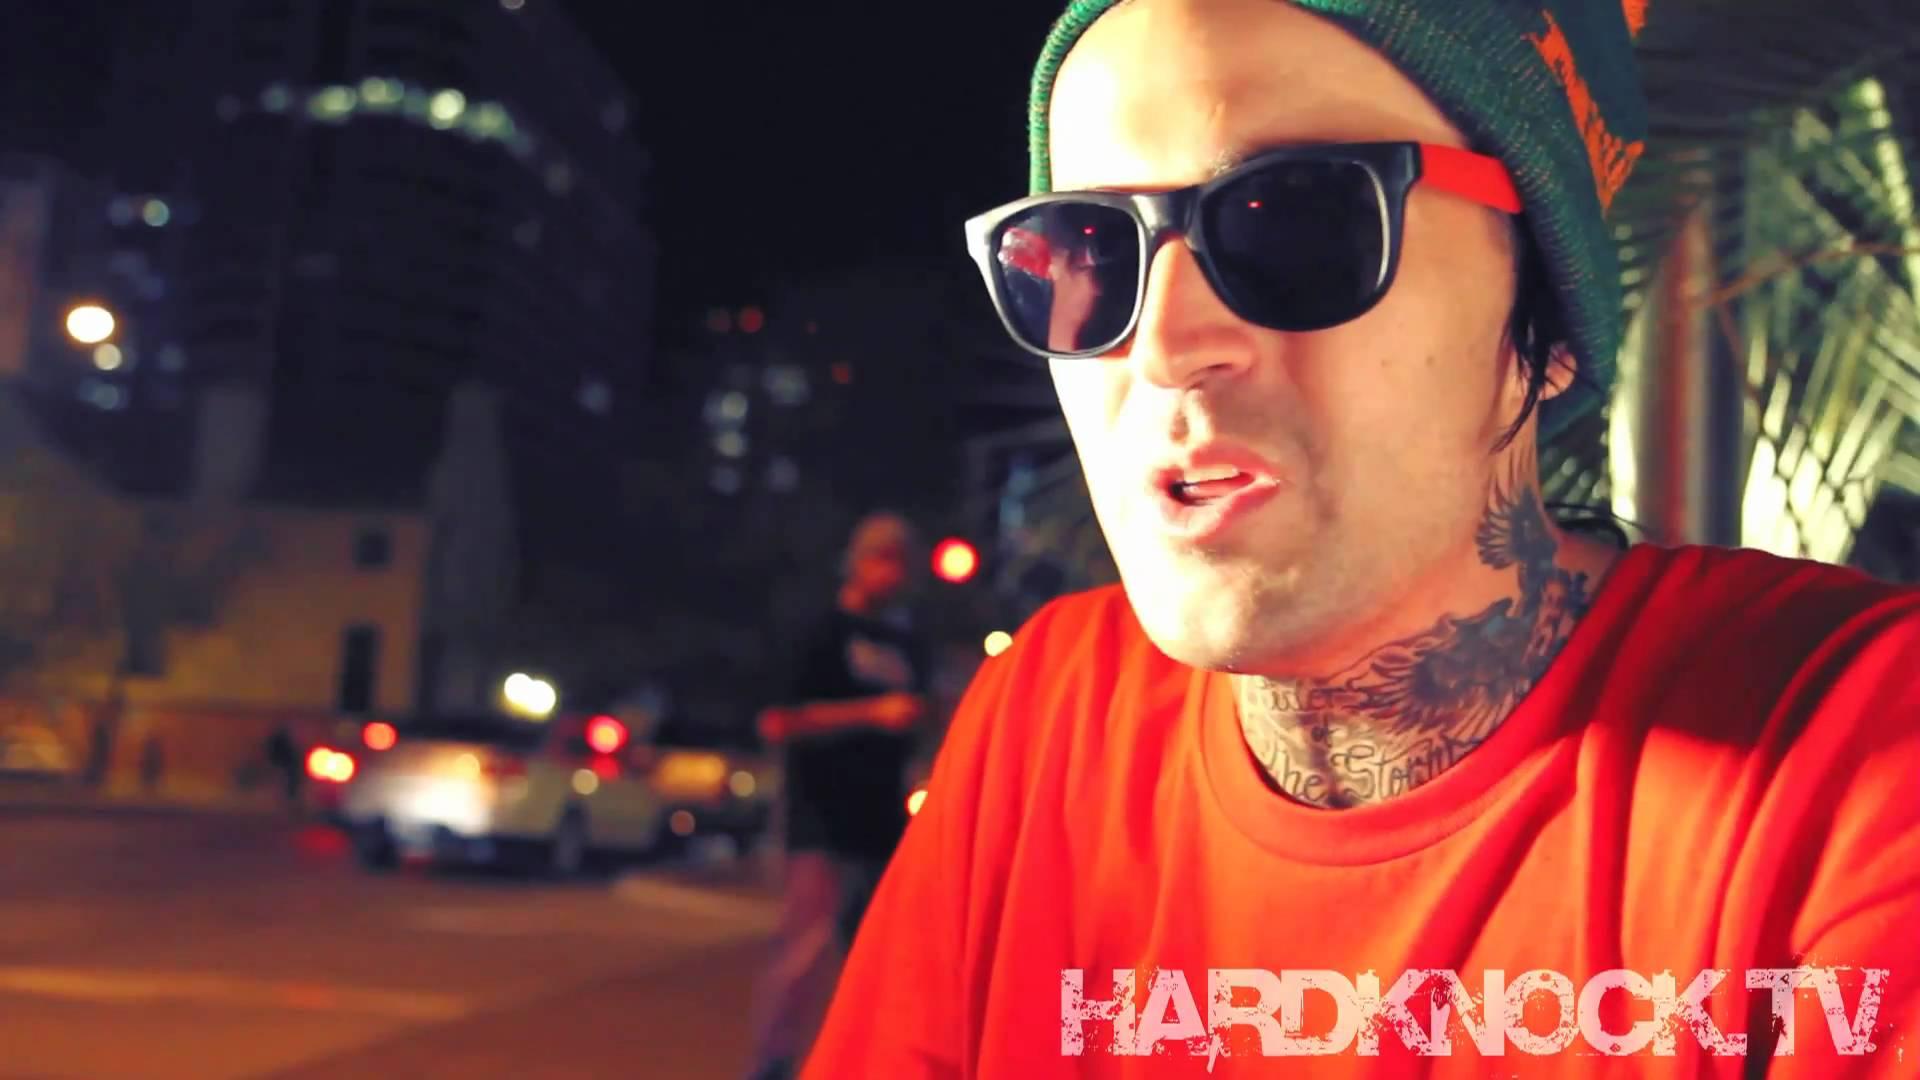 Yelawolf talks BOB, Wiz Khalifa, being Hip Hop + Shots w/Fans interview by Nick Huff Barili